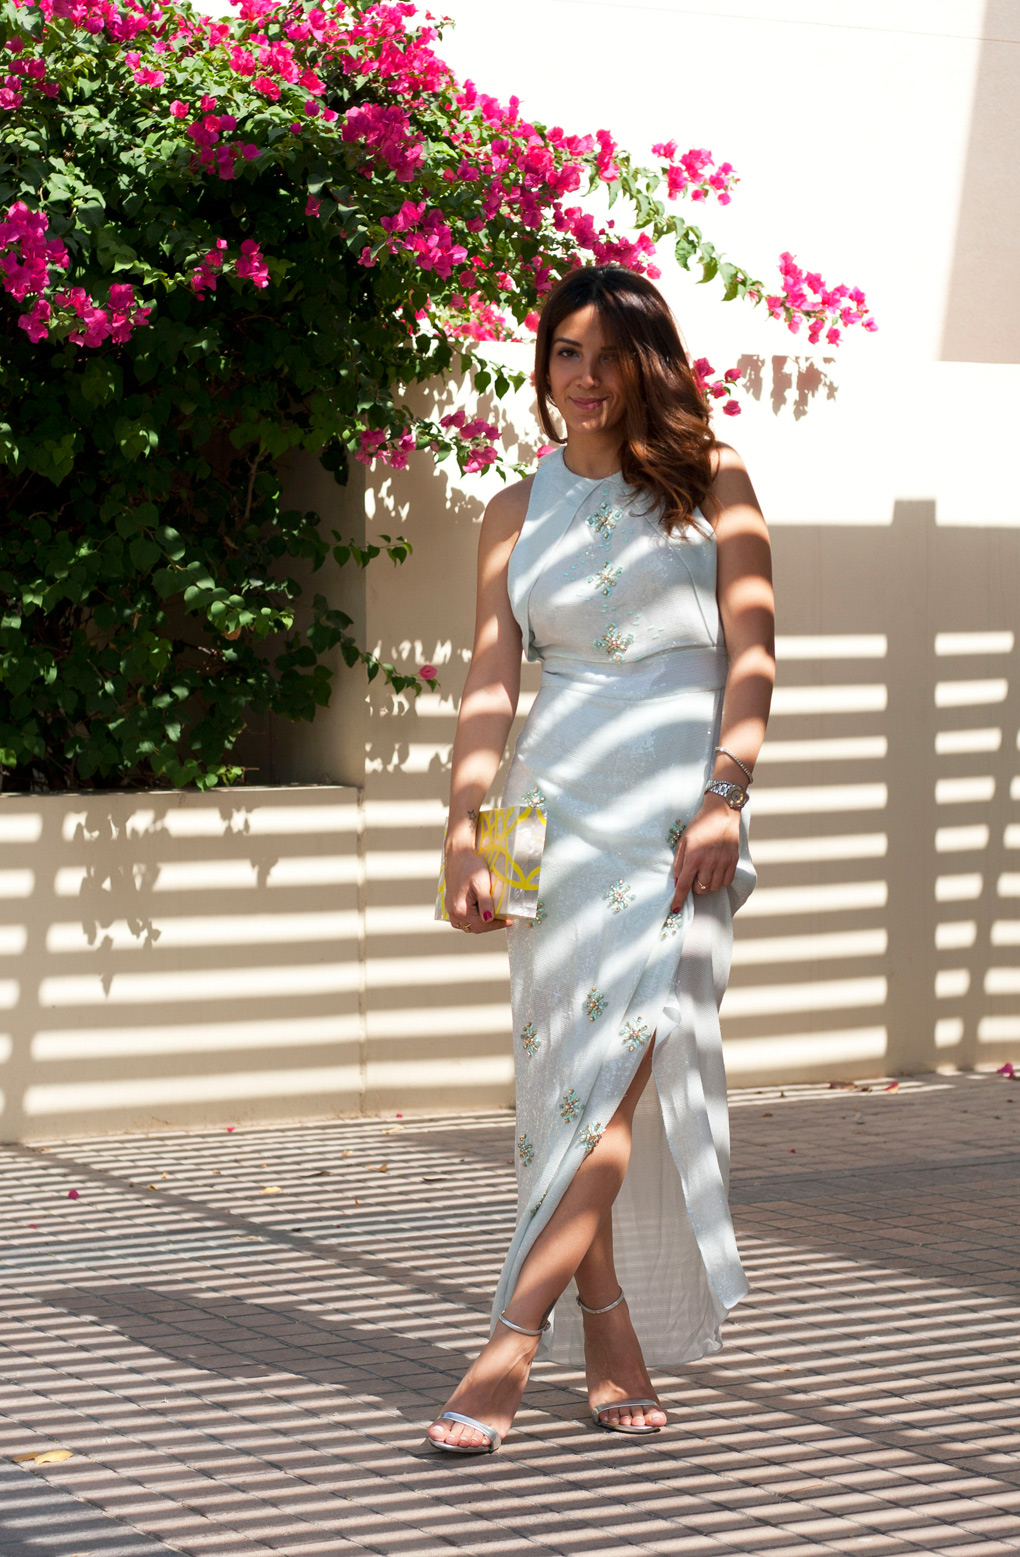 Lyla_Loves_Fashion_Toujouri_Dress_Nathalie_Trad_Clutch_Wedding_9247